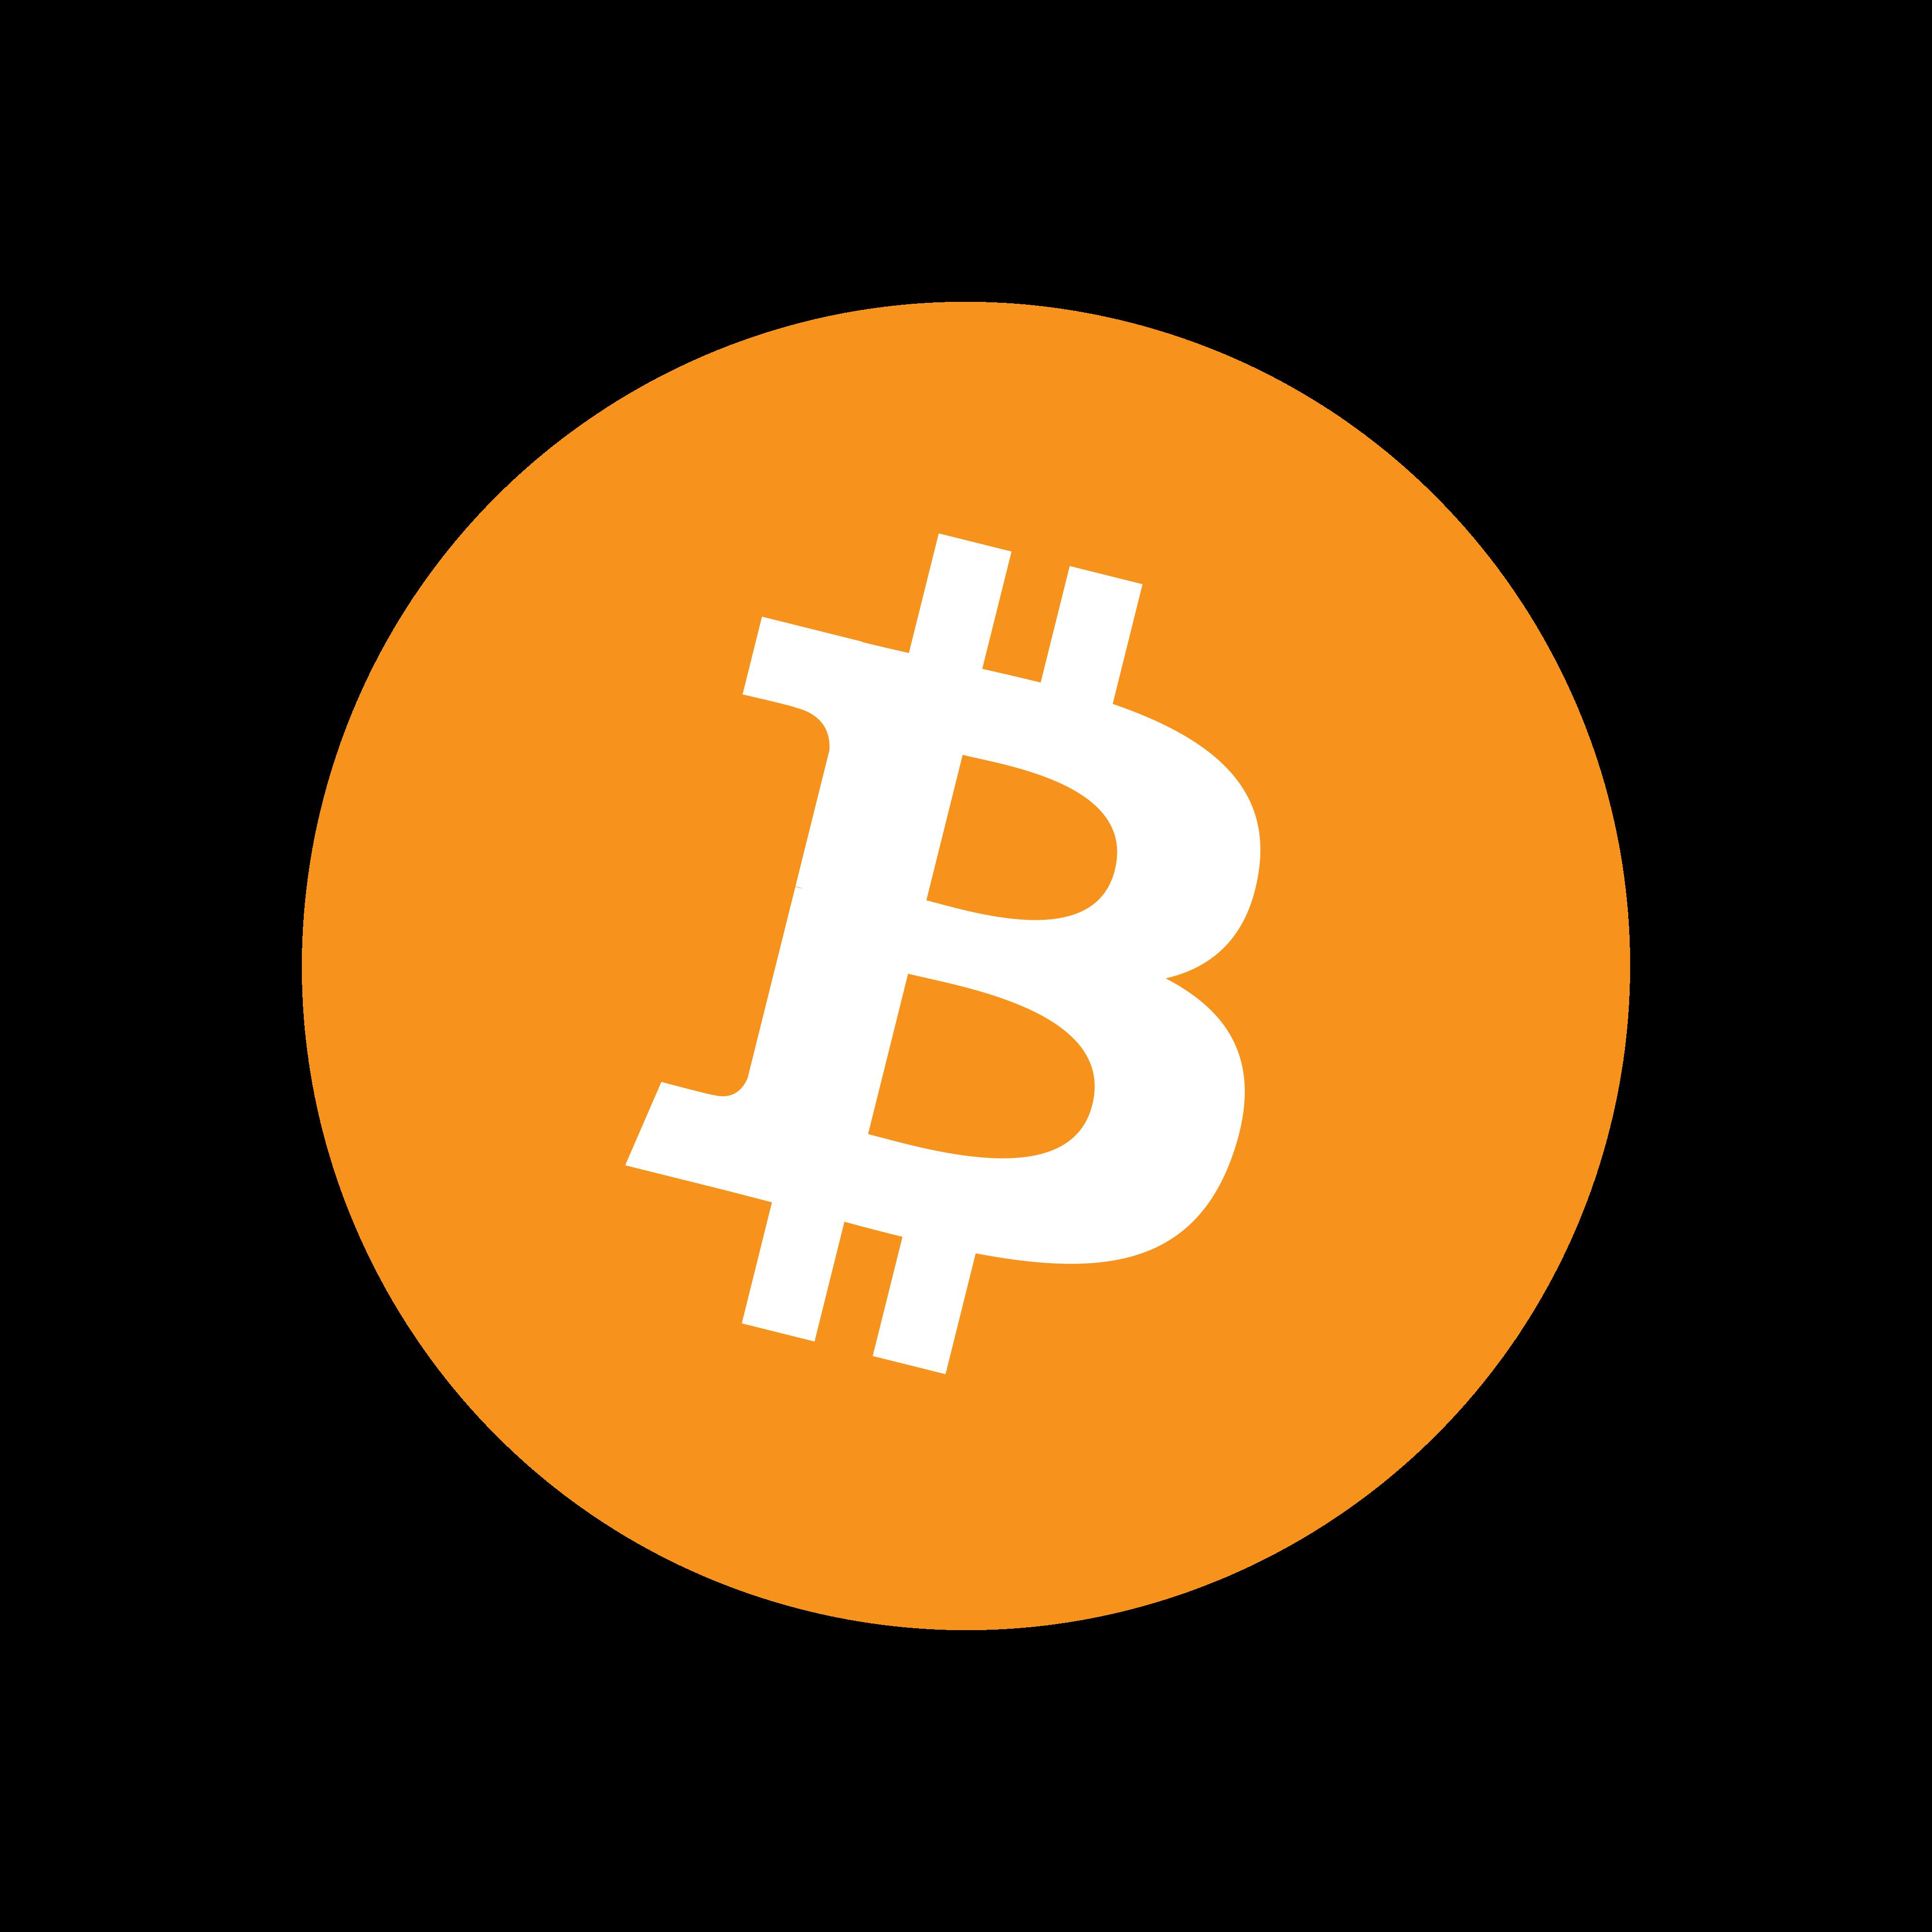 bitcoin logo 0 1 - Bitcoin Logo